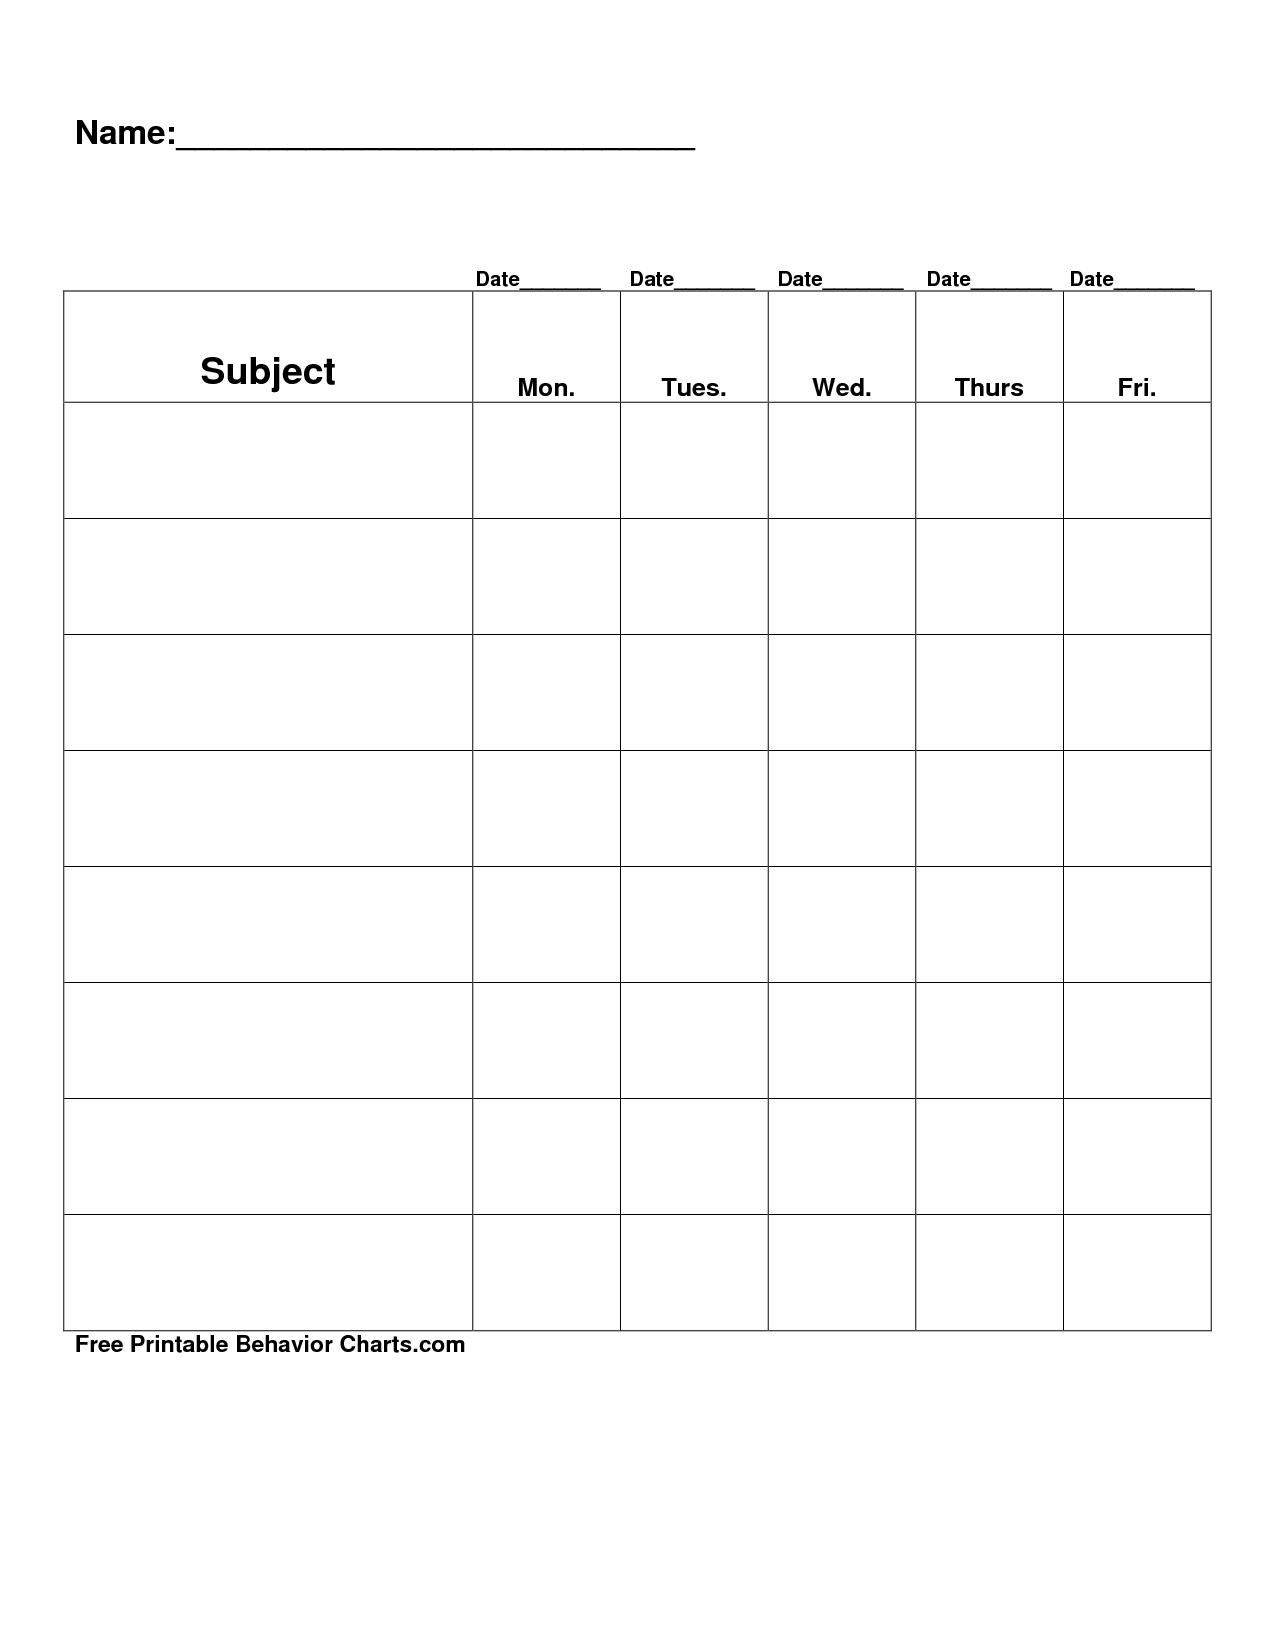 Free Printable Blank Charts | Free Printable Behavior Charts Com pertaining to Free Printable Blank Behavior Charts